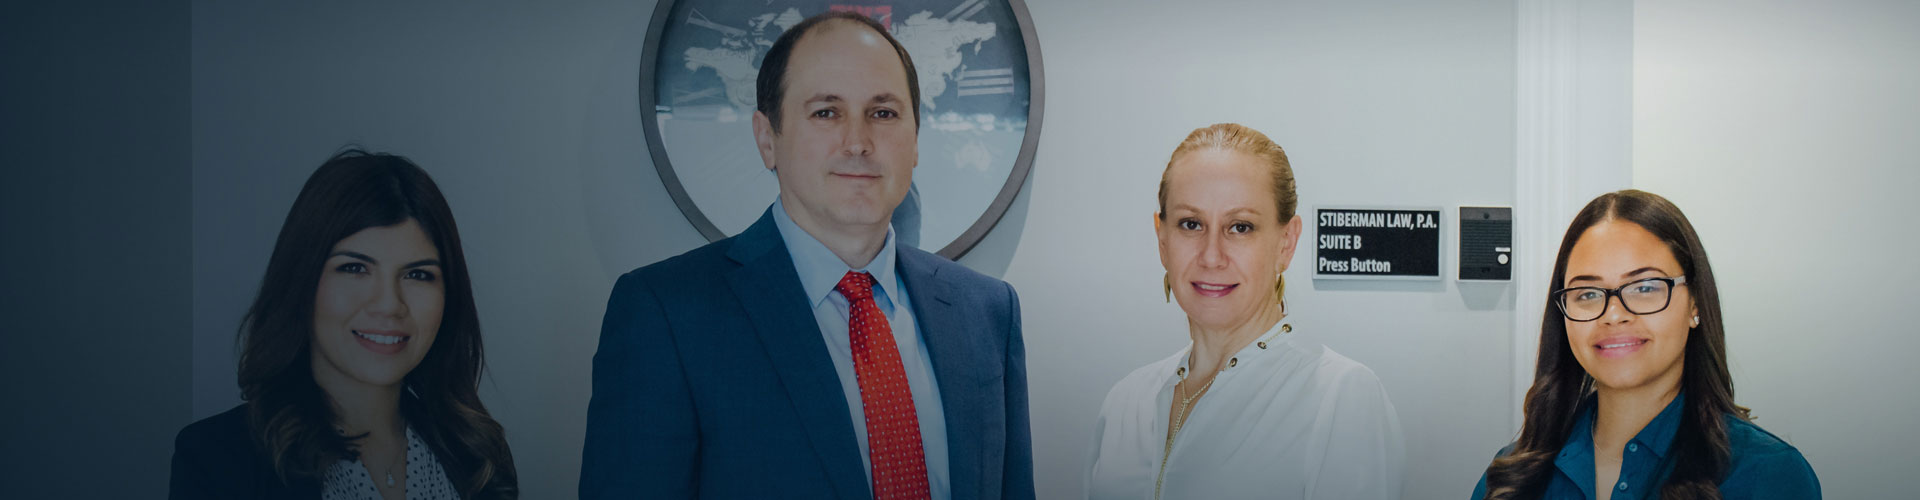 Boca Raton Bankruptcy Attorneys - Stiberman Law Firm